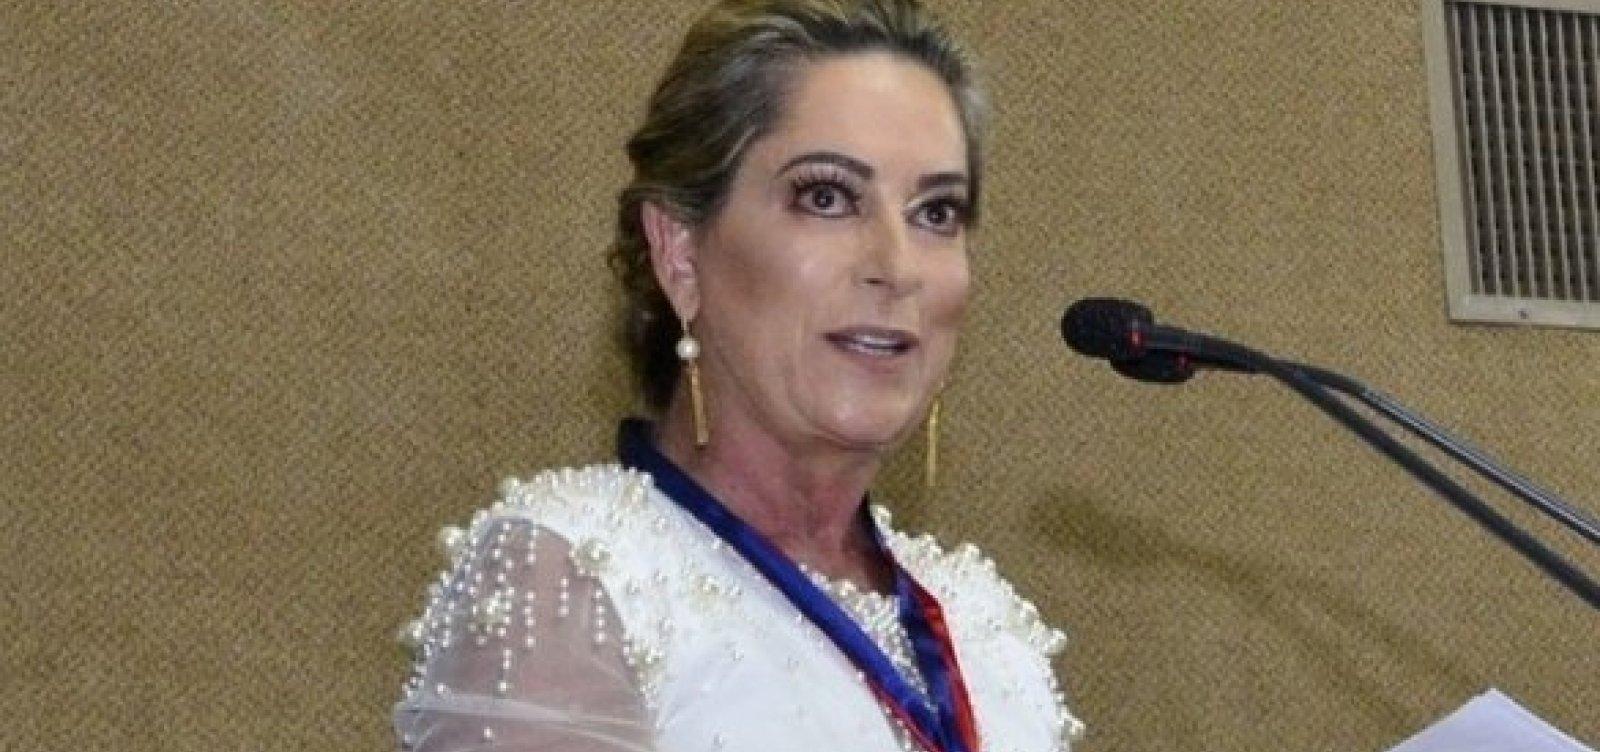 DESEMBARGADORA DO TJ-BA ACUSADA NA FAROESTE PRESA NESTE DOMINGO